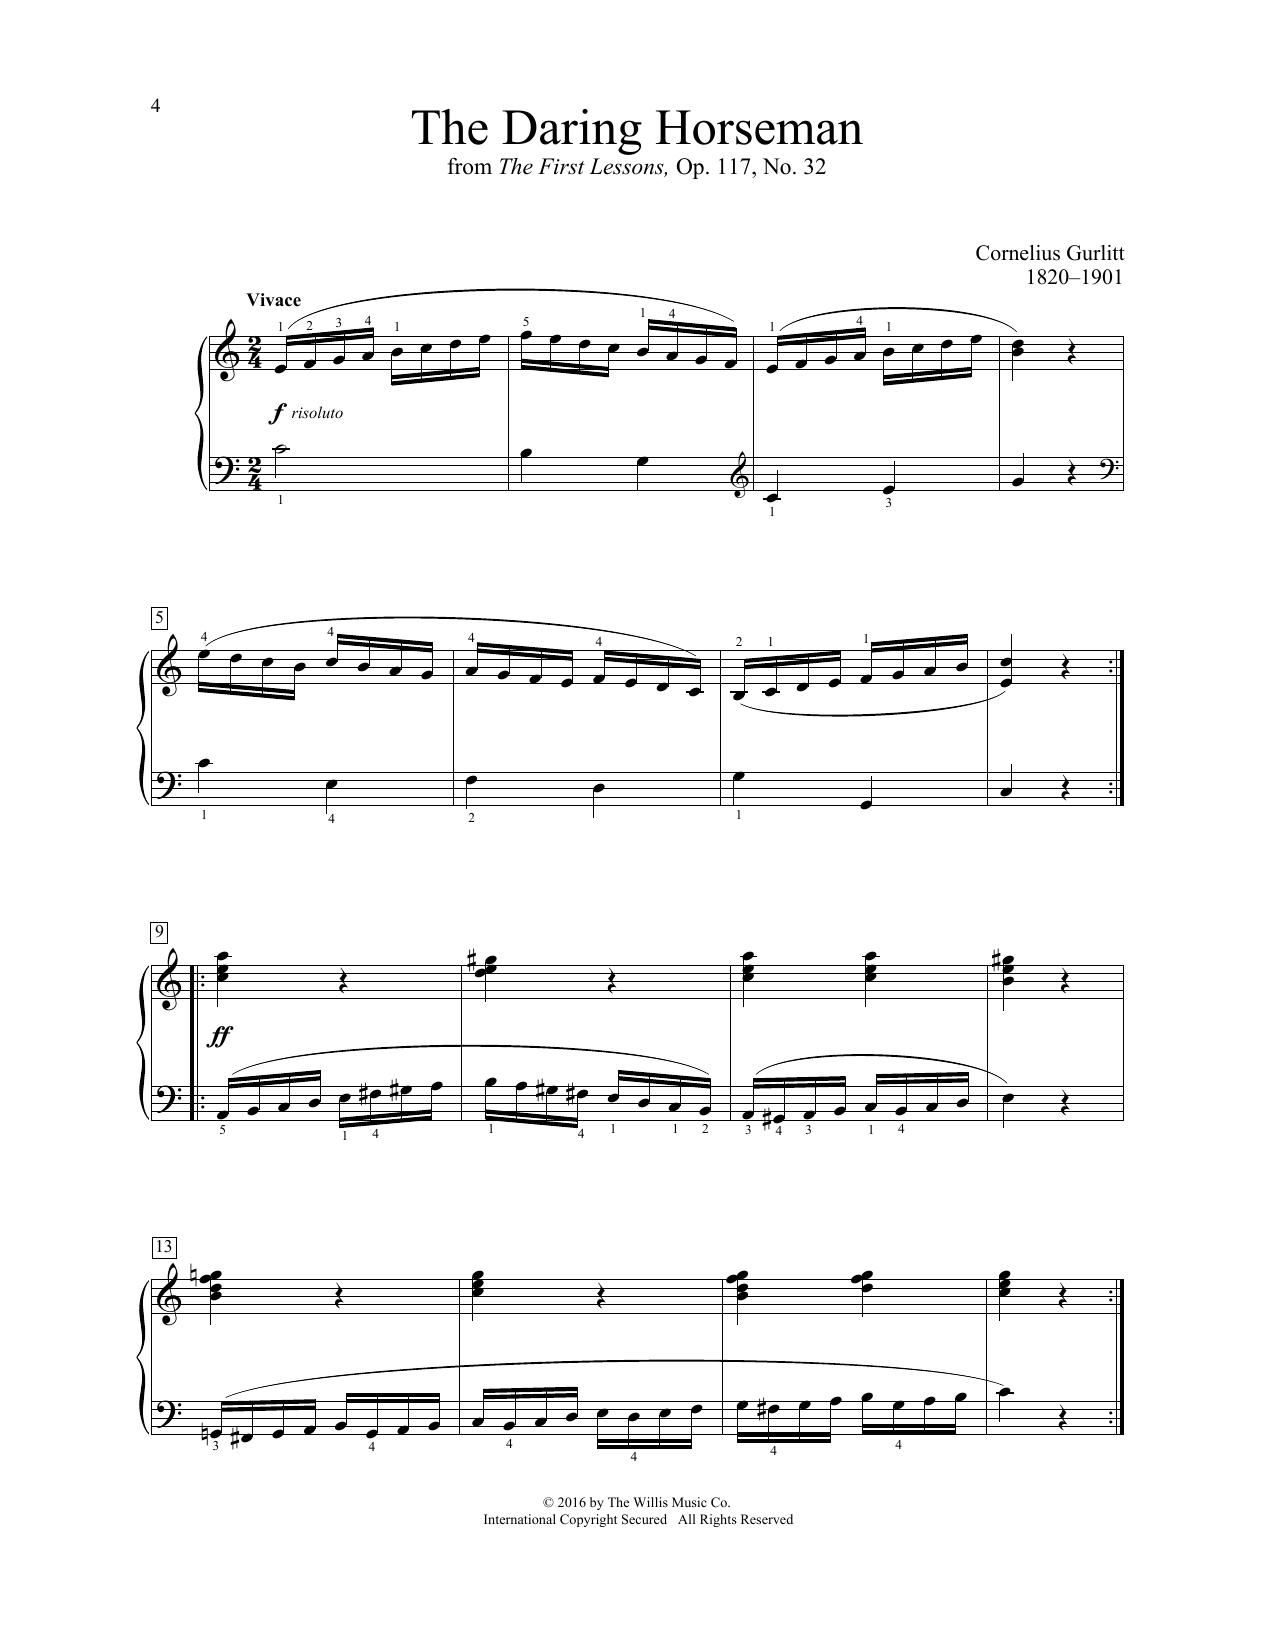 Cornelius Gurlitt The Daring Horseman sheet music notes and chords. Download Printable PDF.